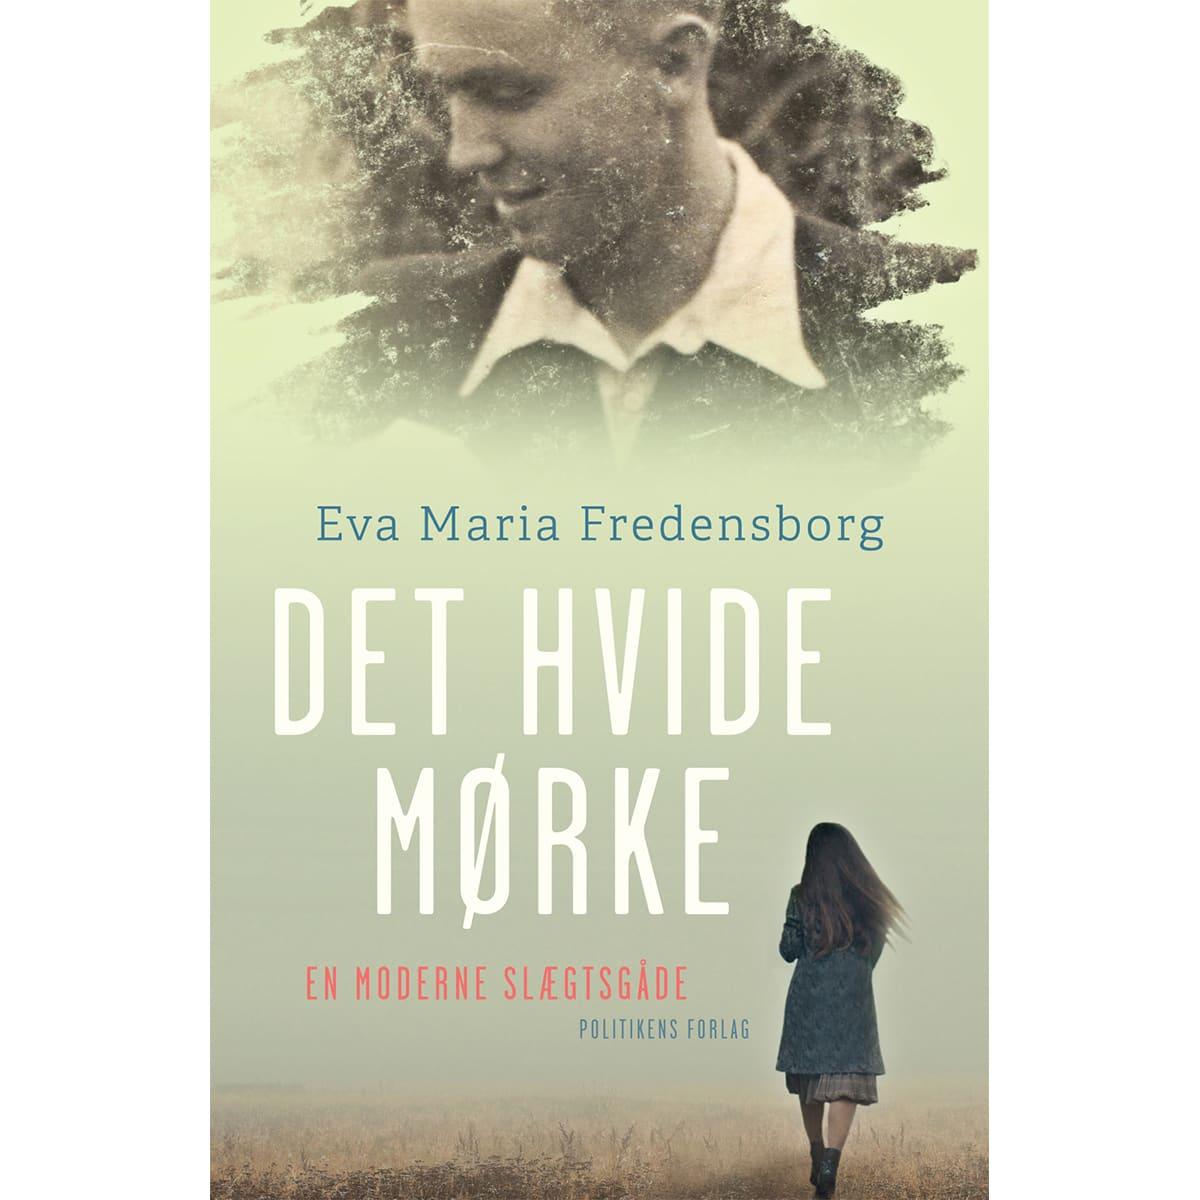 Af Eva Maria Fredensborg